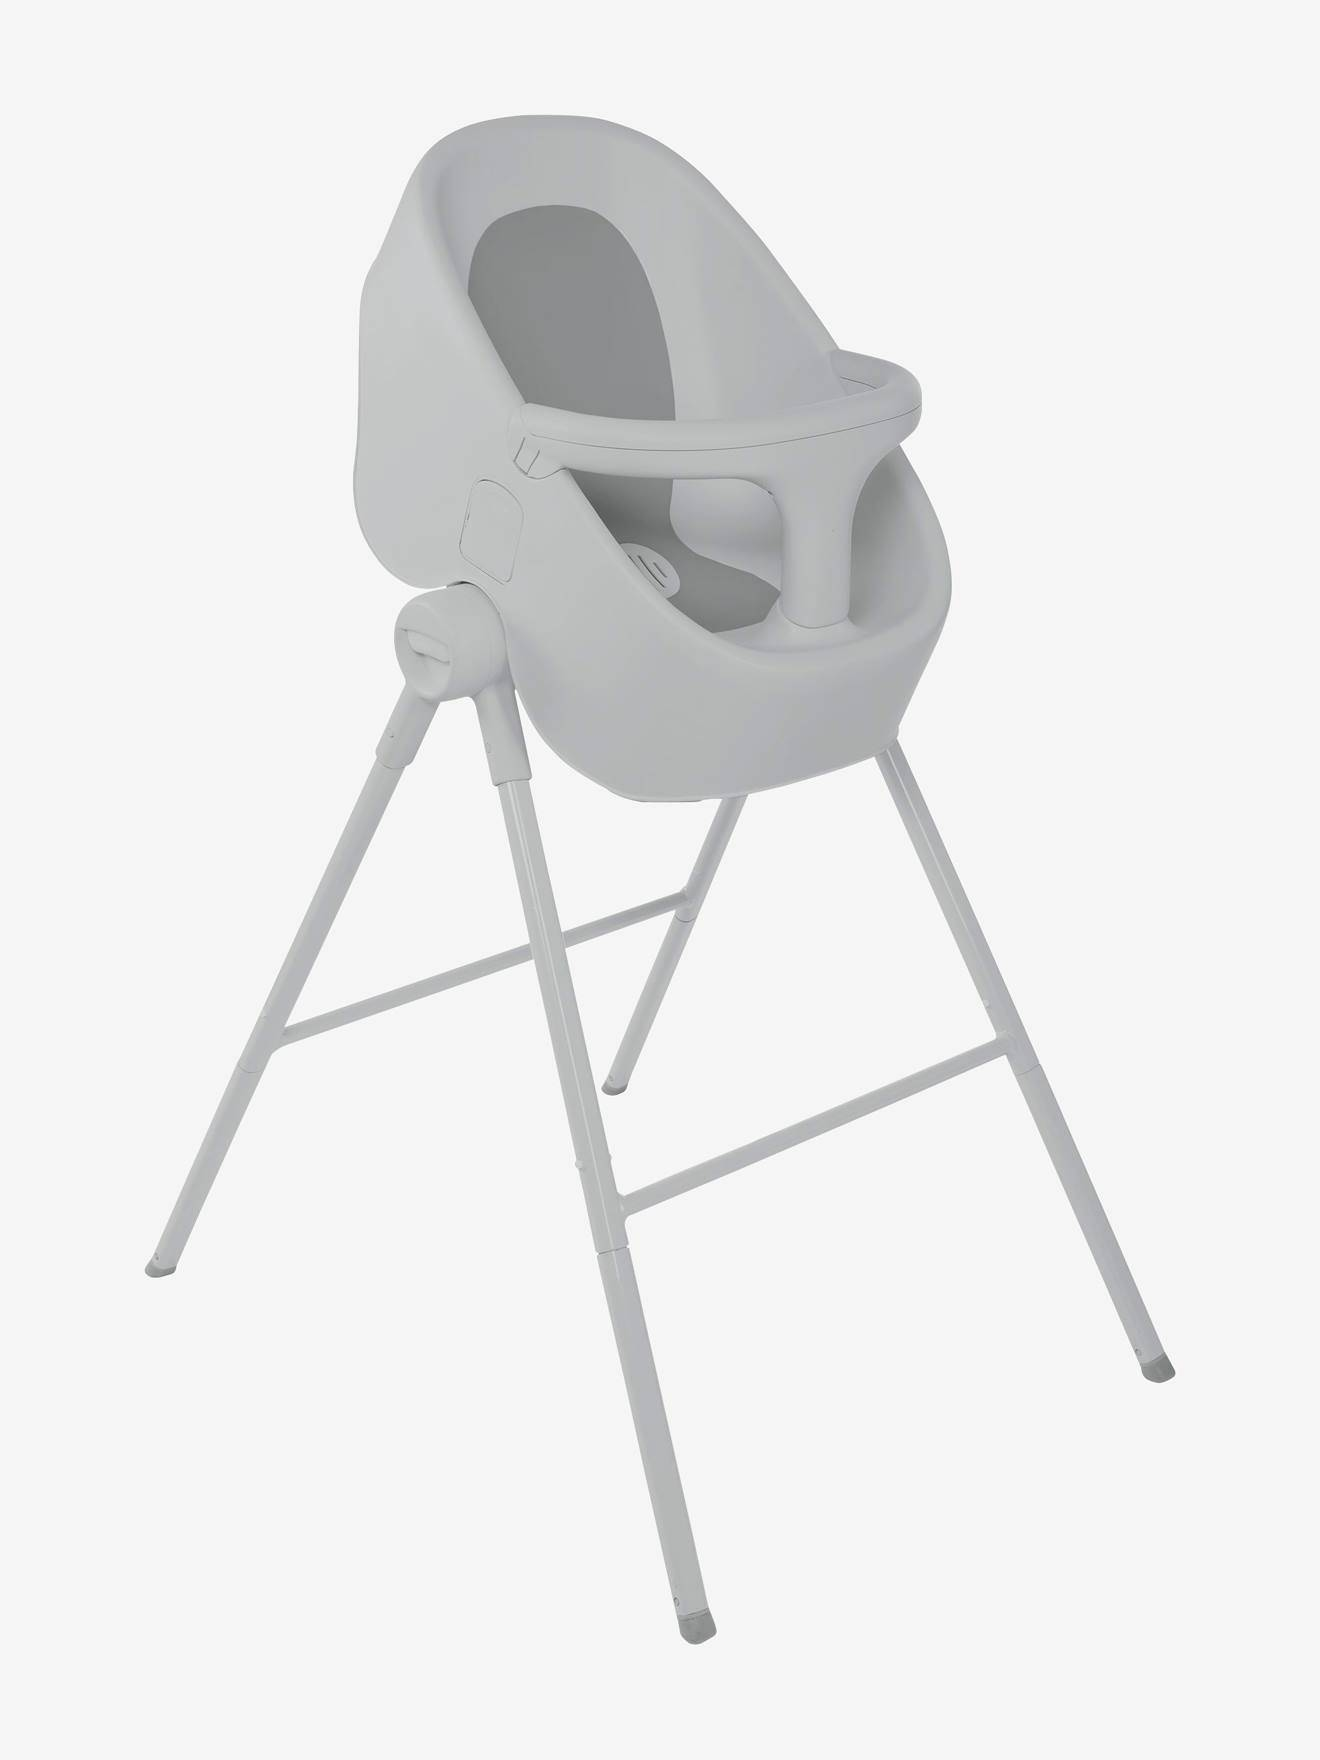 CHICCO Bañera-ducha Bubble Nest CHICCO gris medio liso